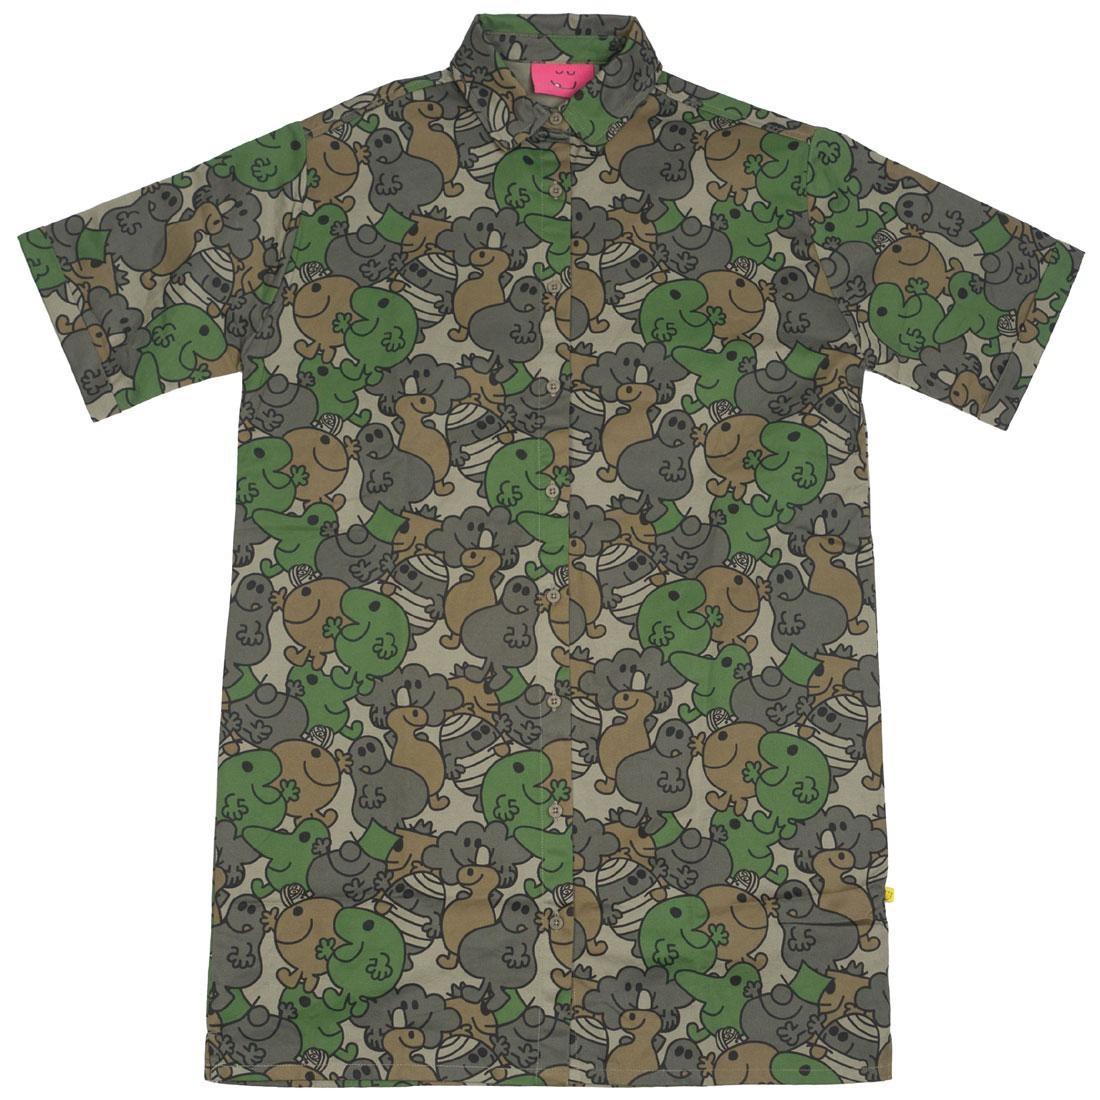 Lazy Oaf x Mr Men Women Camo Tee Dress (green / brown)